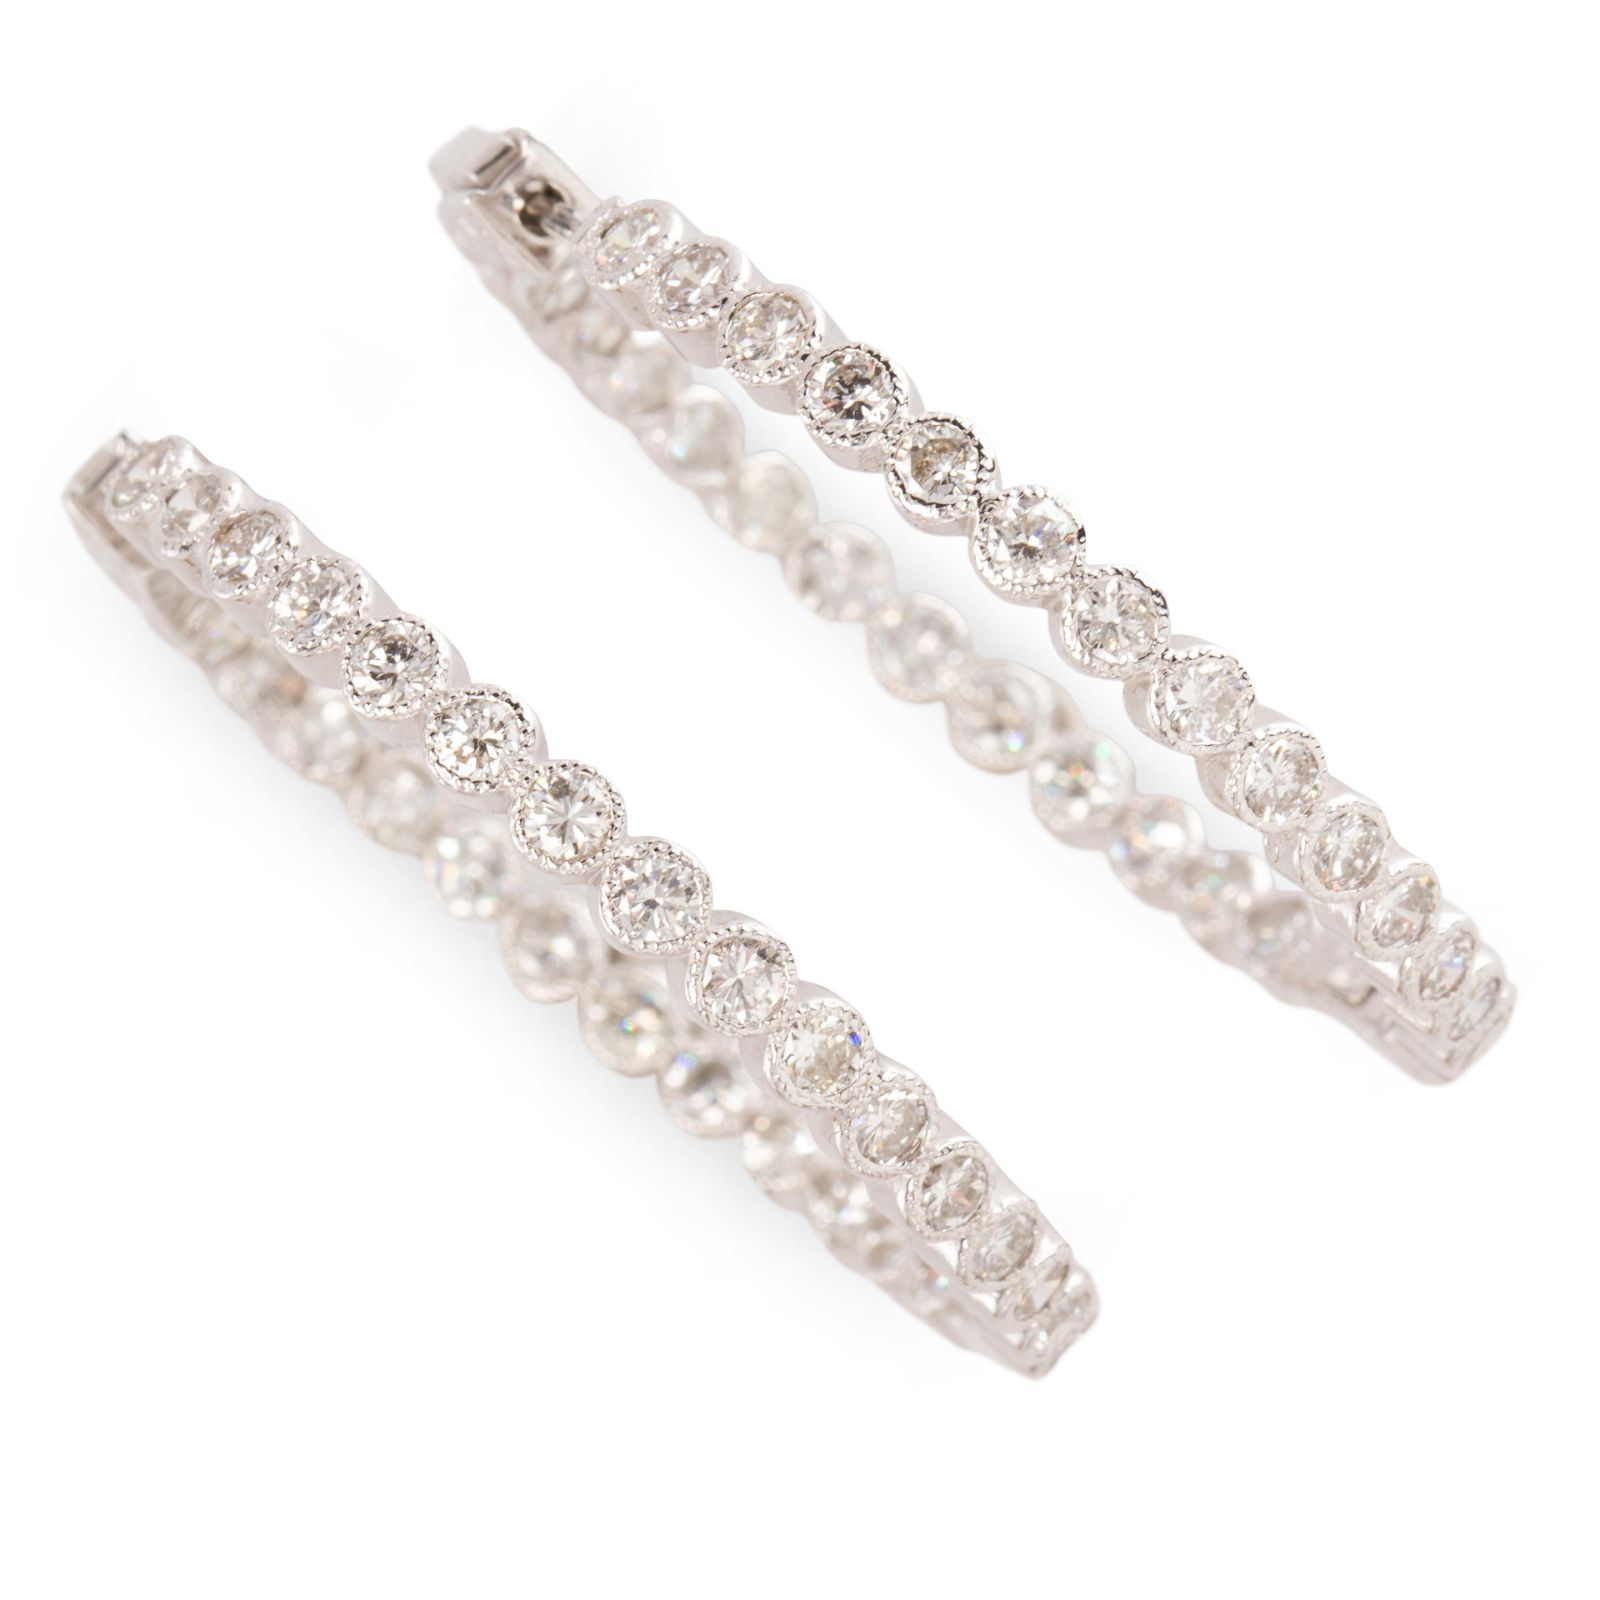 A pair of diamond and eighteen karat white gold hoop